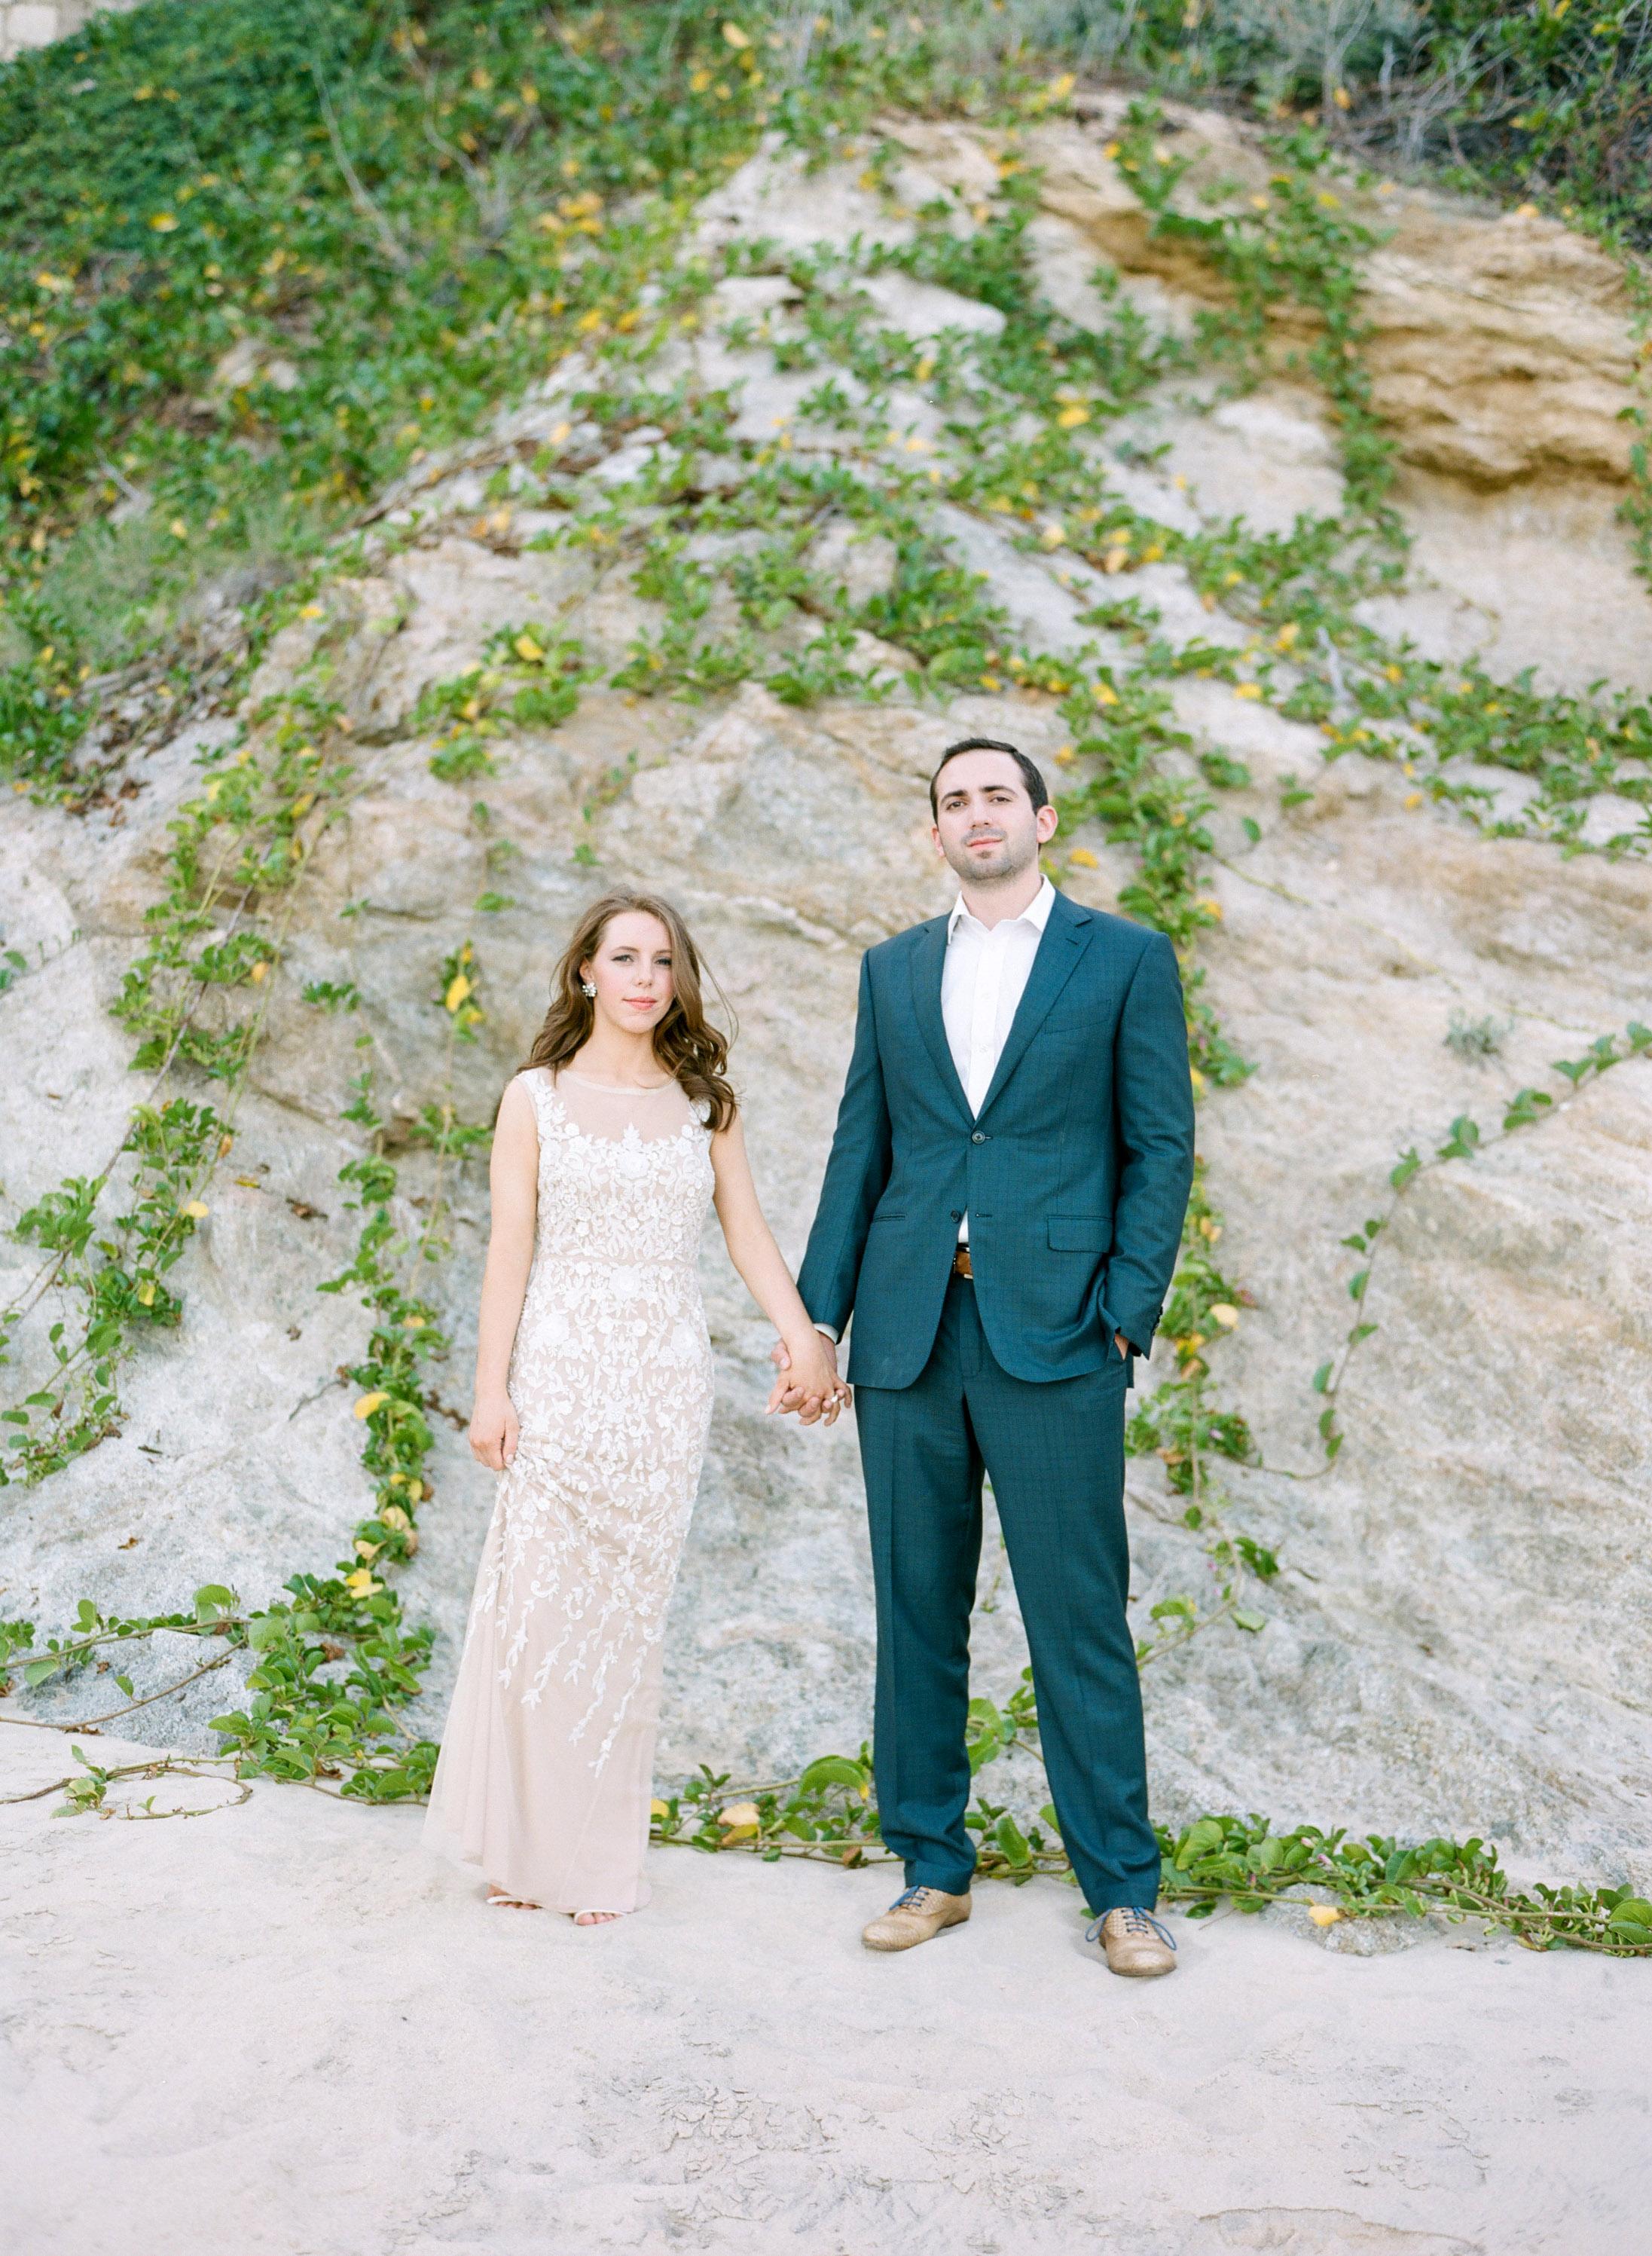 Dana-Fernandez-Photography-Destination-Wedding-Photographer-Cabo-San-Lucas-Film-Houston-Texas-Cabo-10.jpg